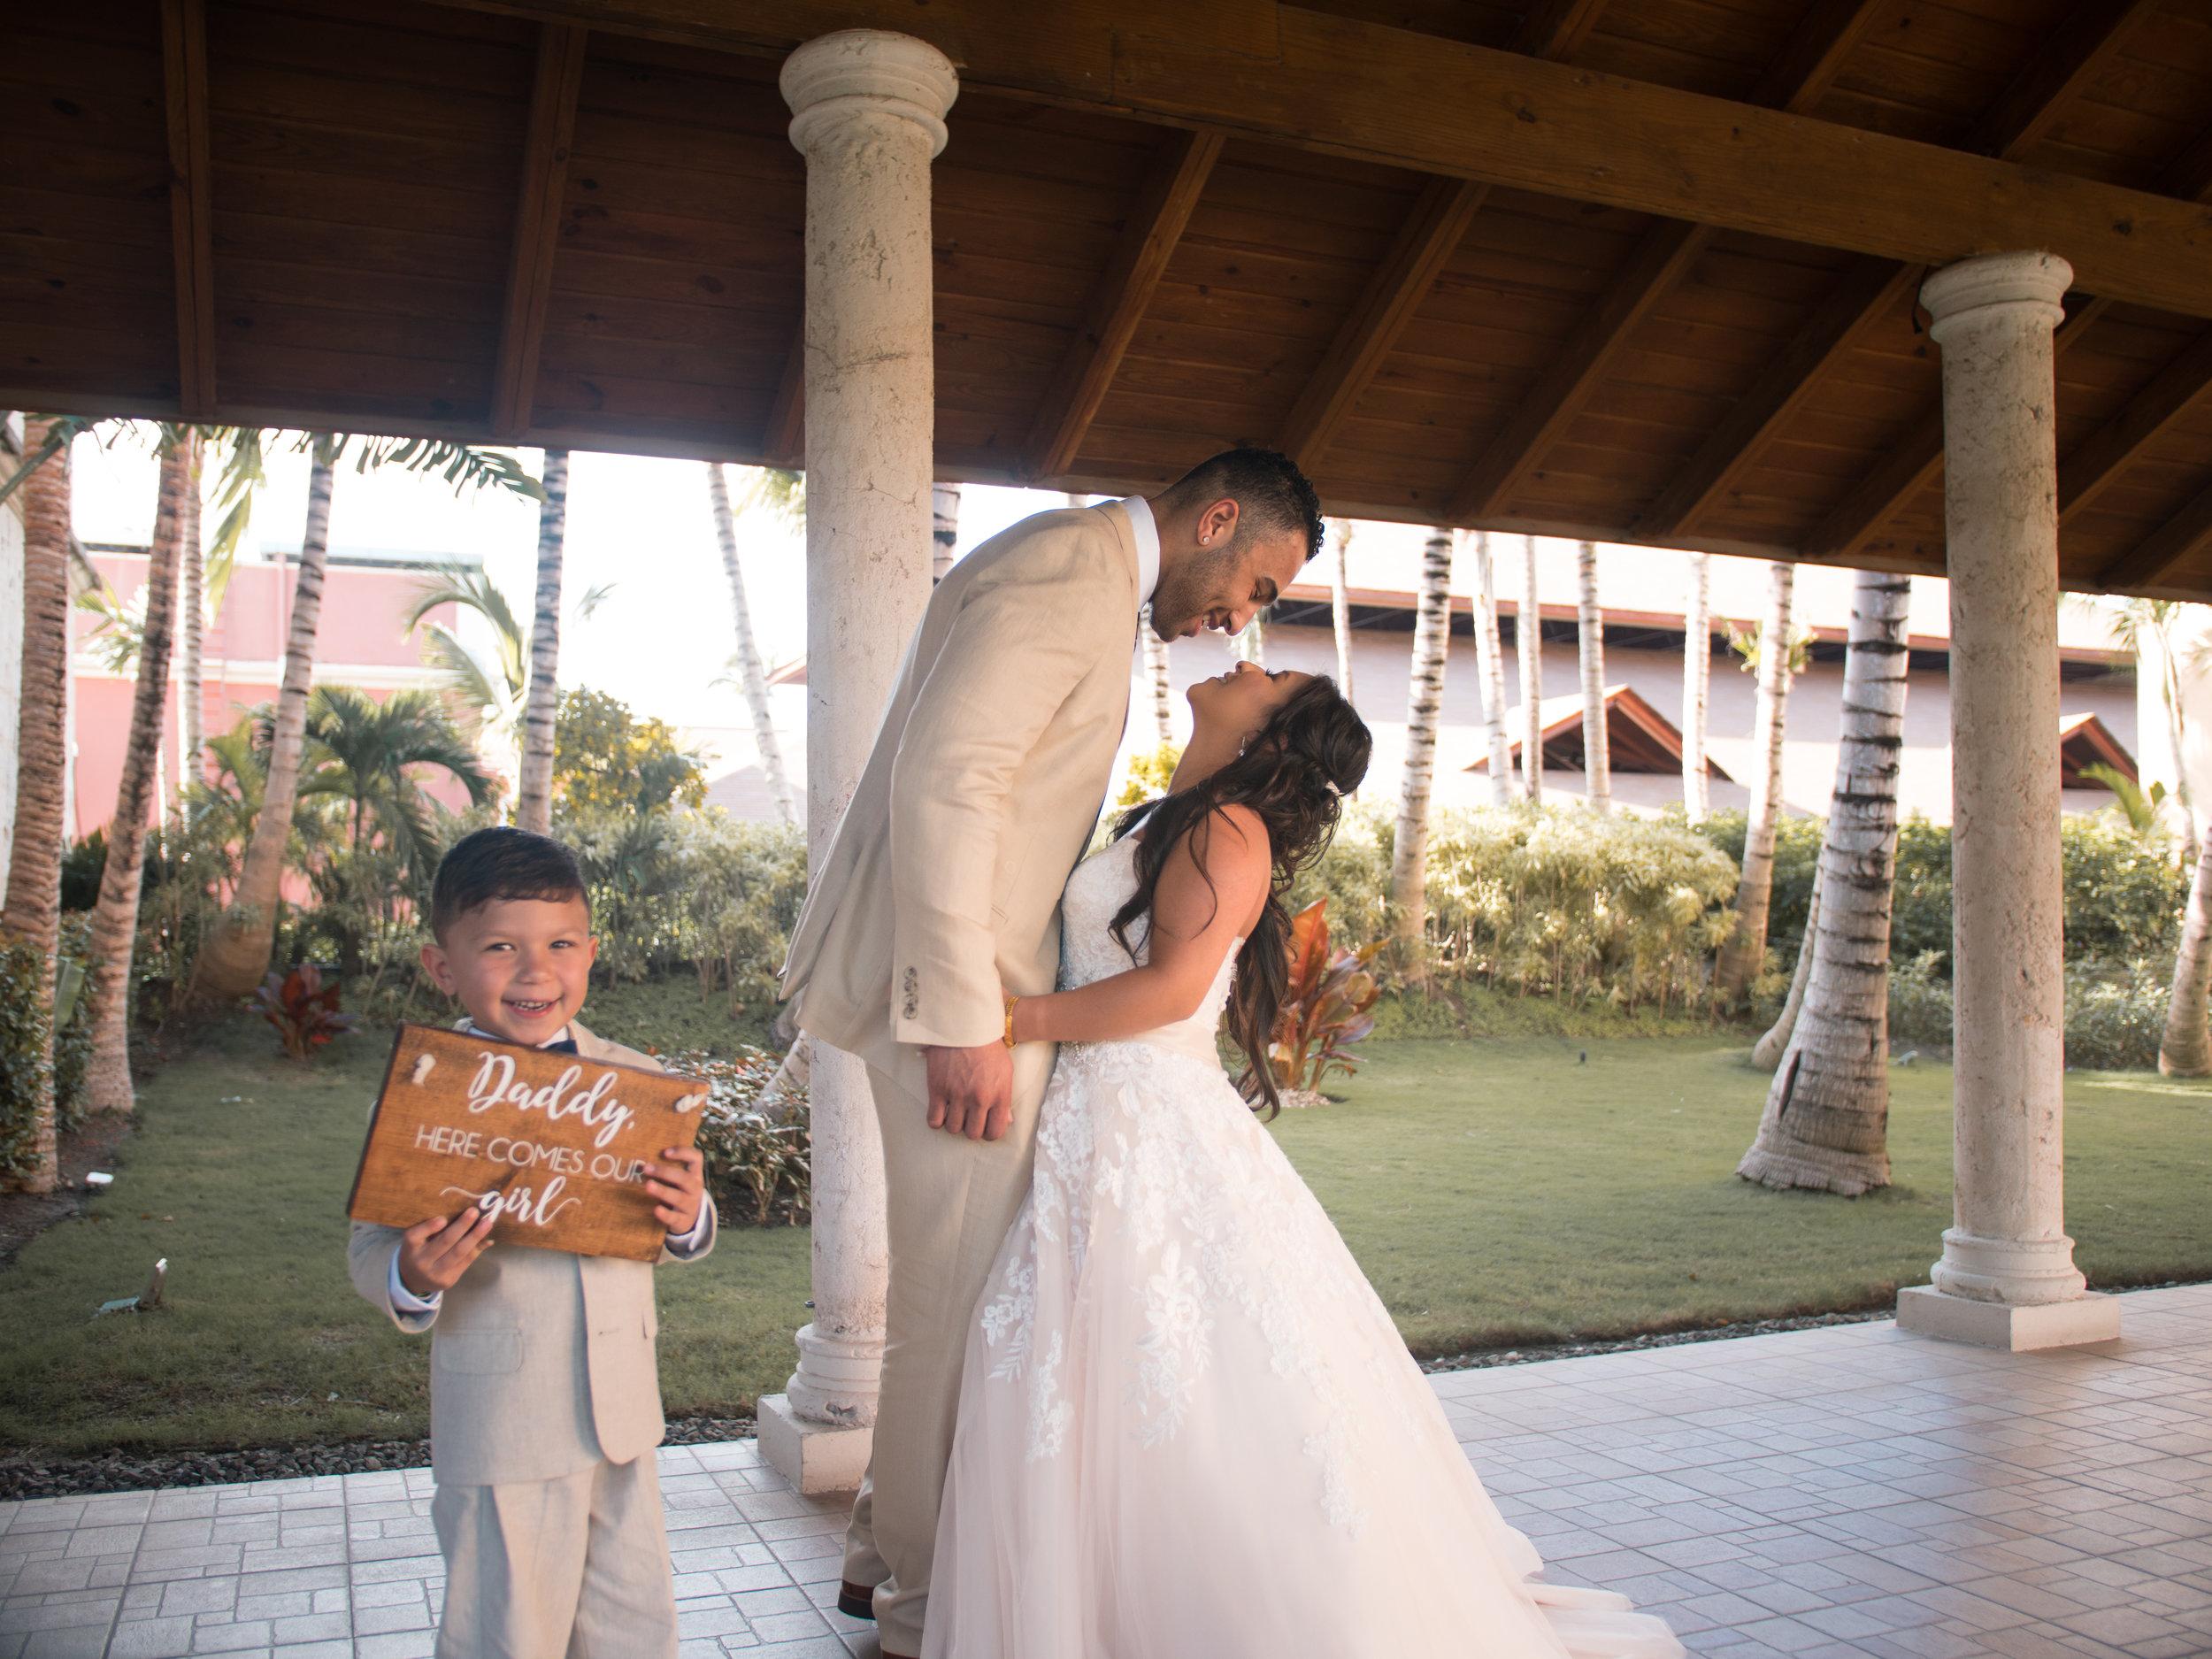 Majestic Elegance resort in the Punta Cana Dominican Republic